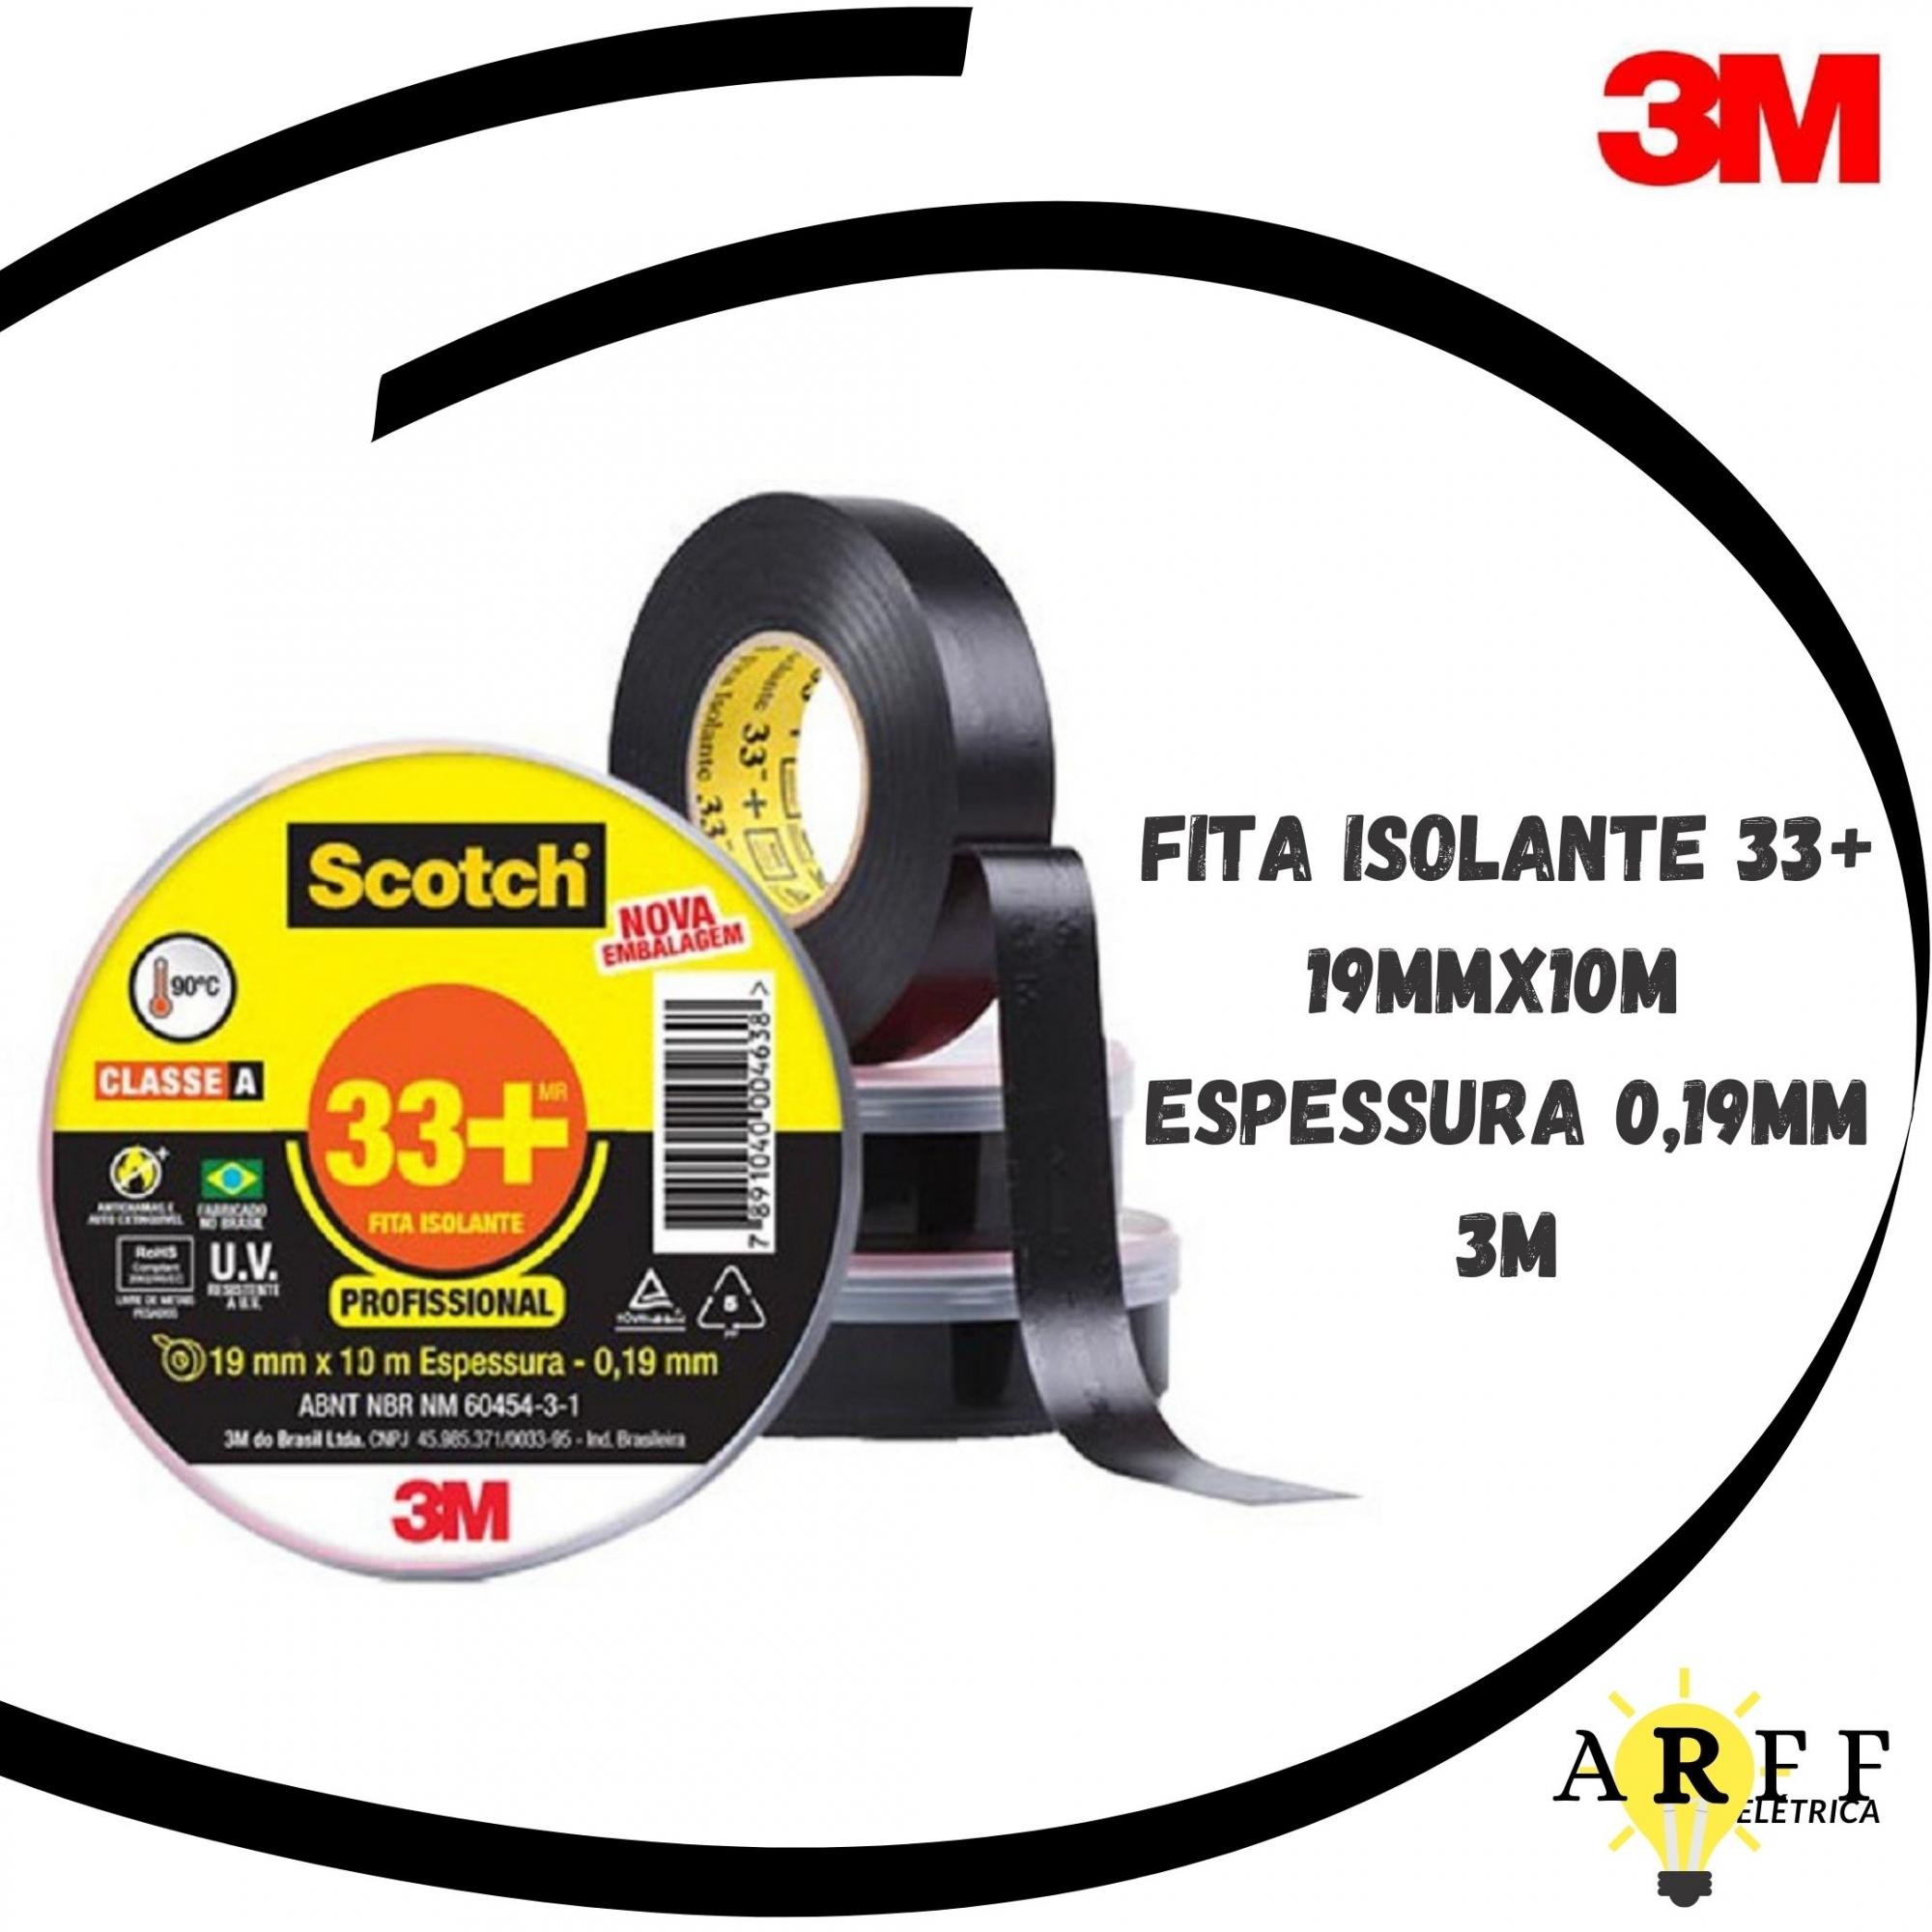 Fita Isolante 33+ 19mmx20m Espessura 0,19mm 3M